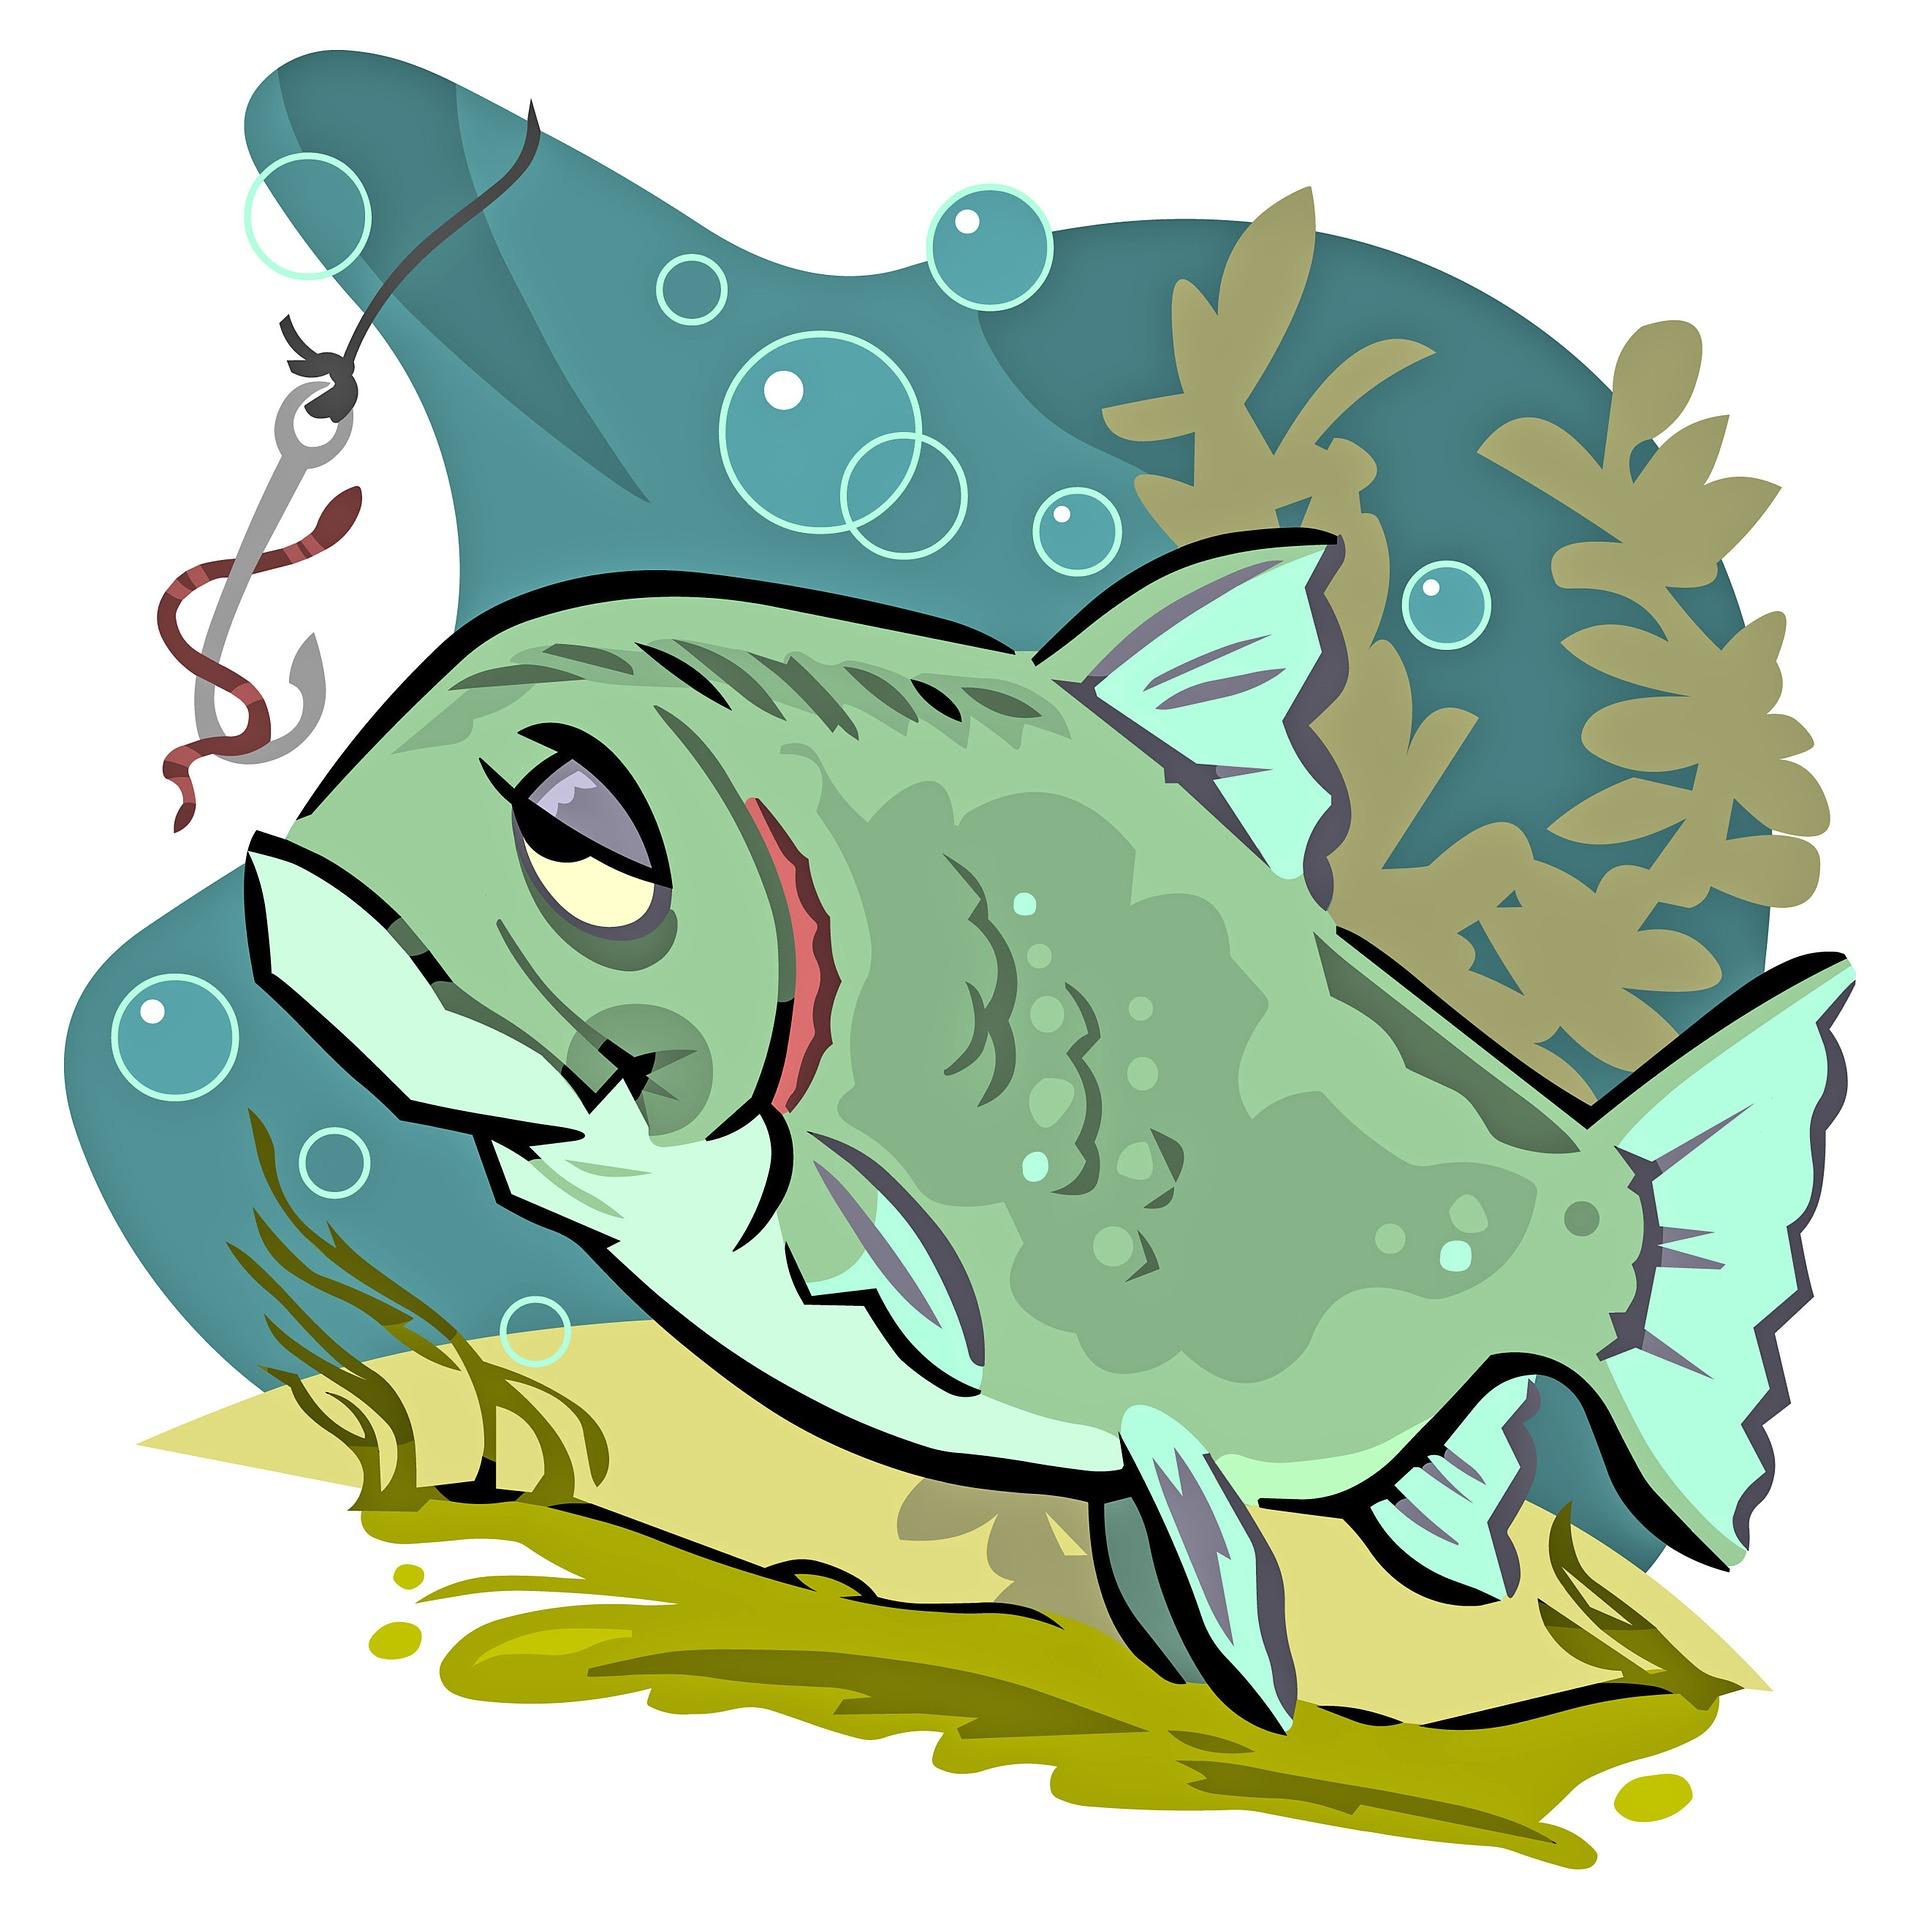 fish-2006060_1920